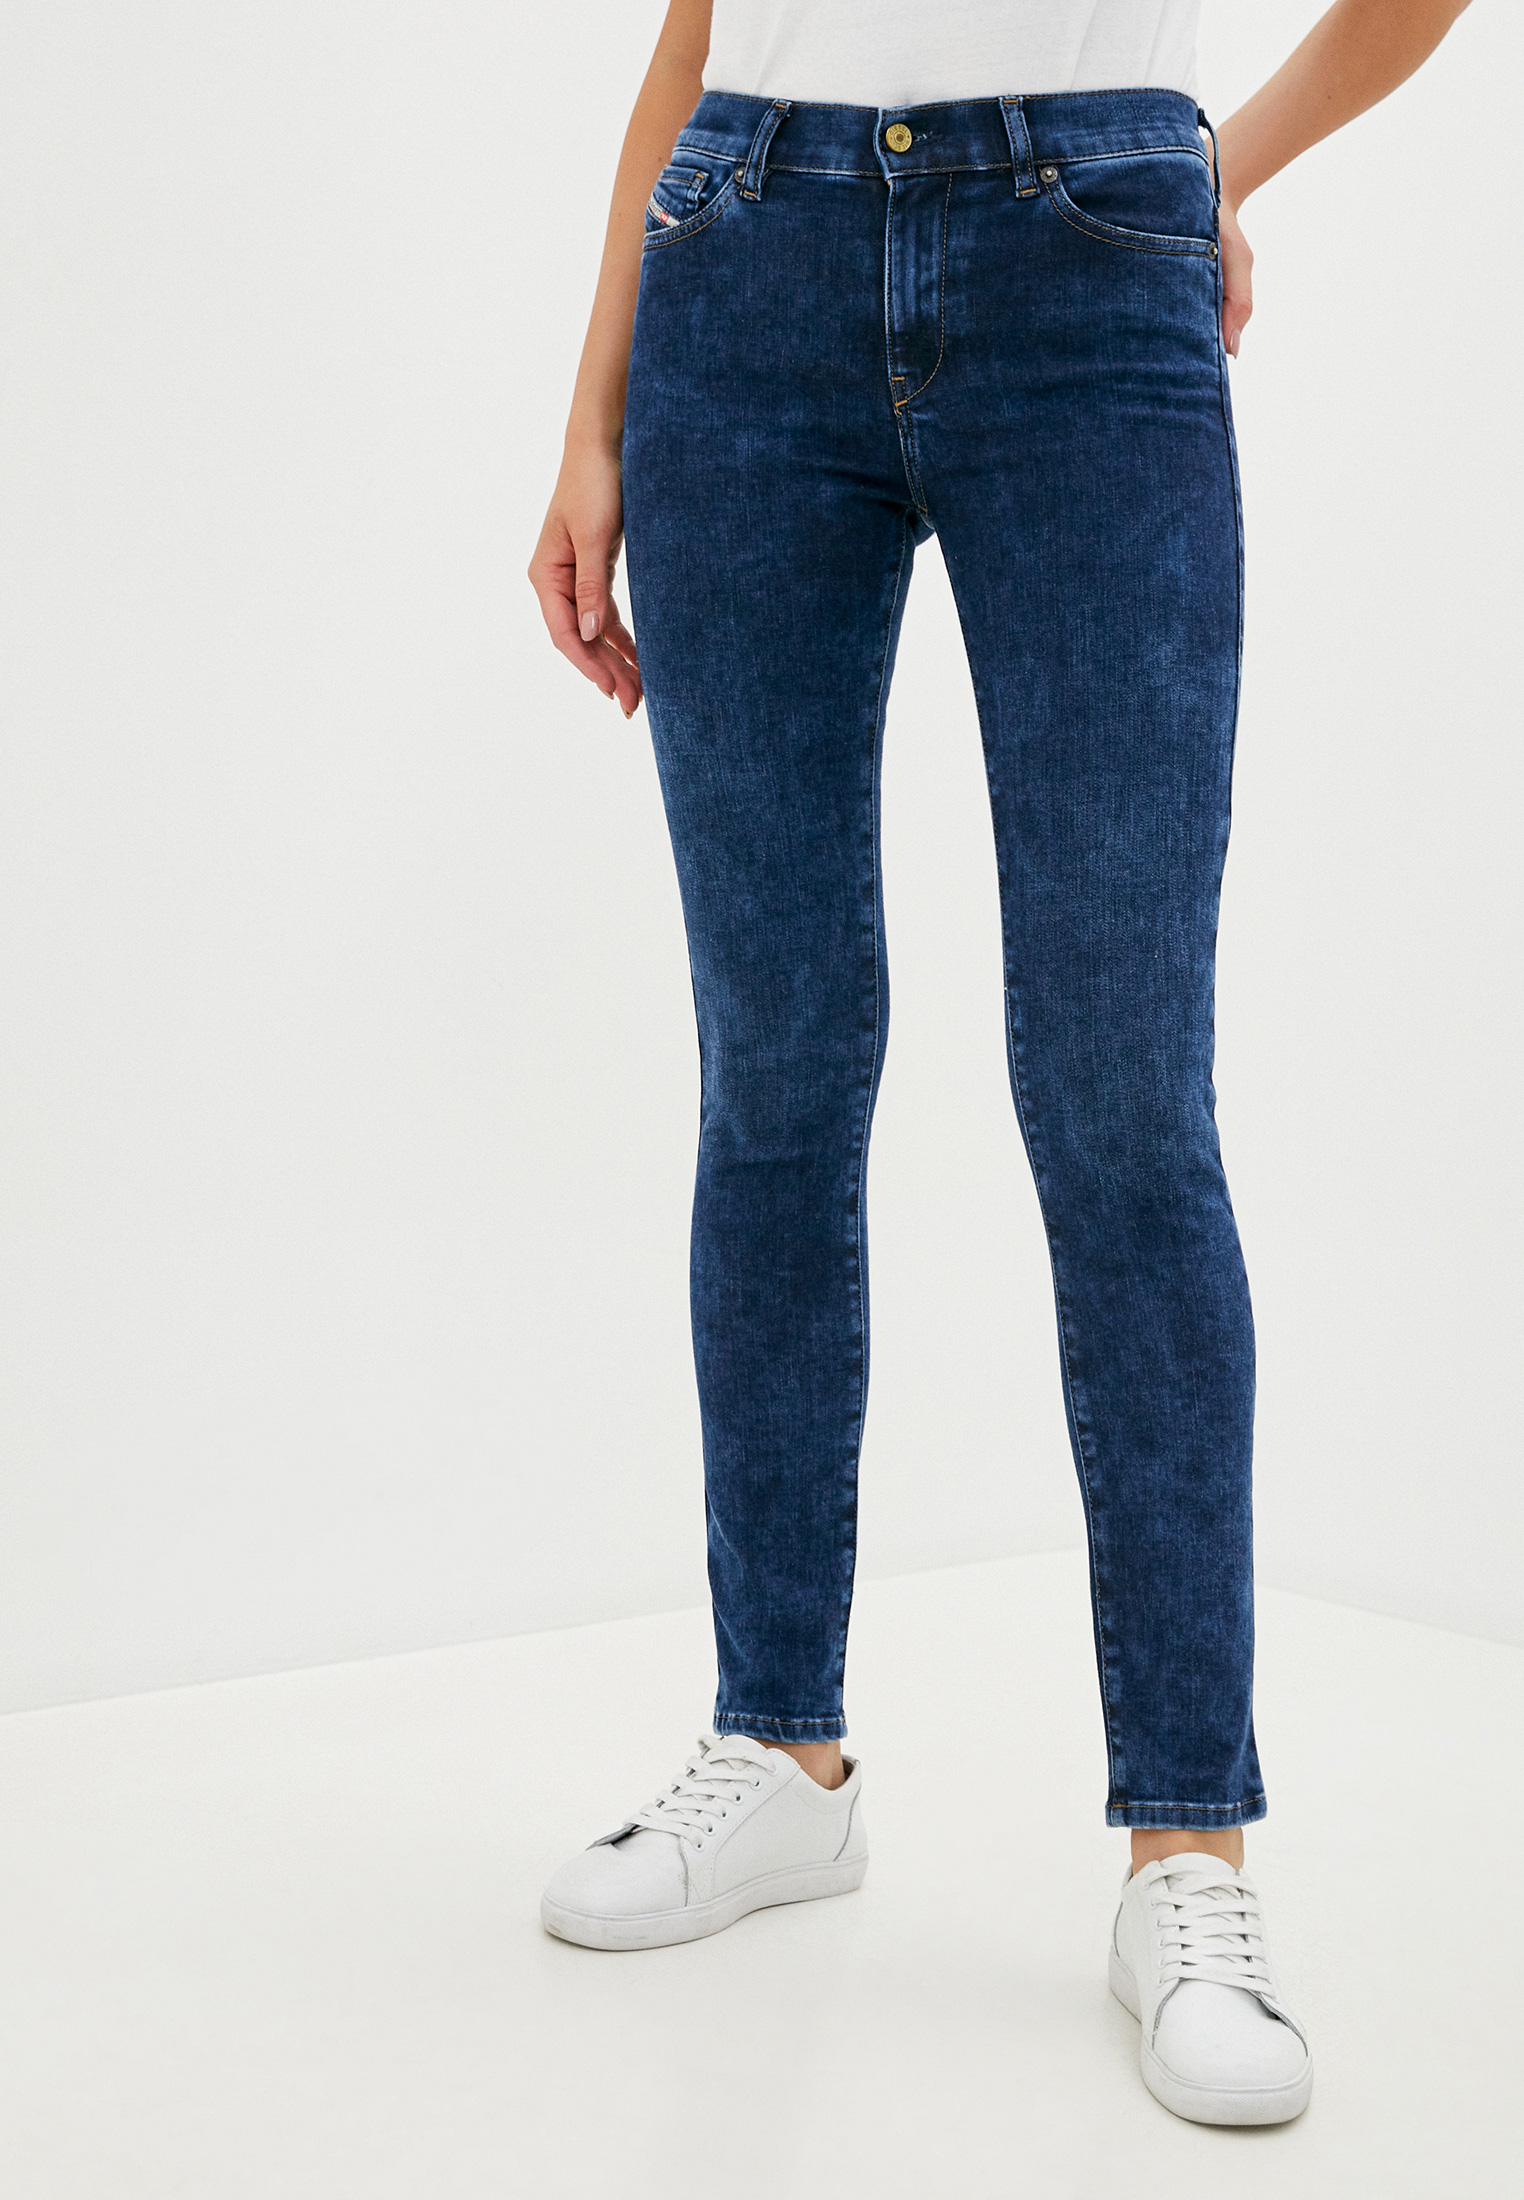 Зауженные джинсы Diesel (Дизель) 00STRN009CY